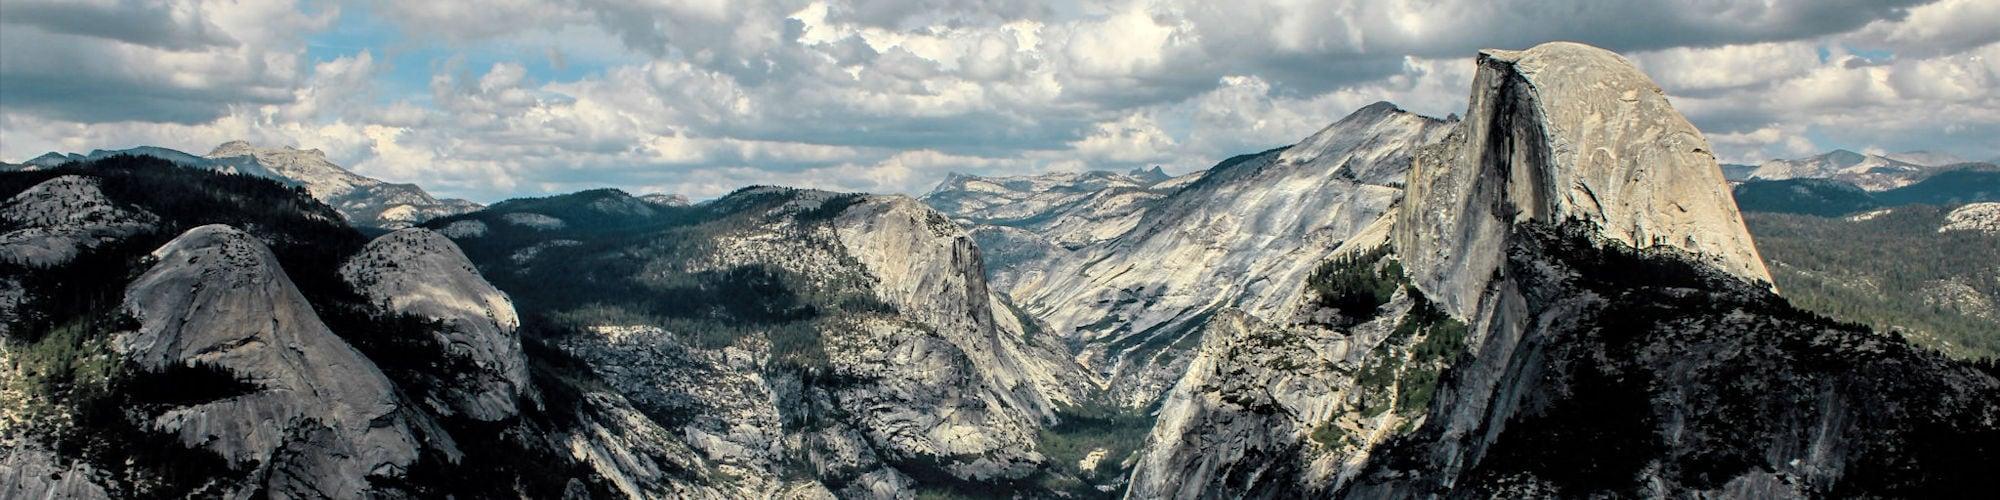 Reiseberichte Yosemite Nationalpark